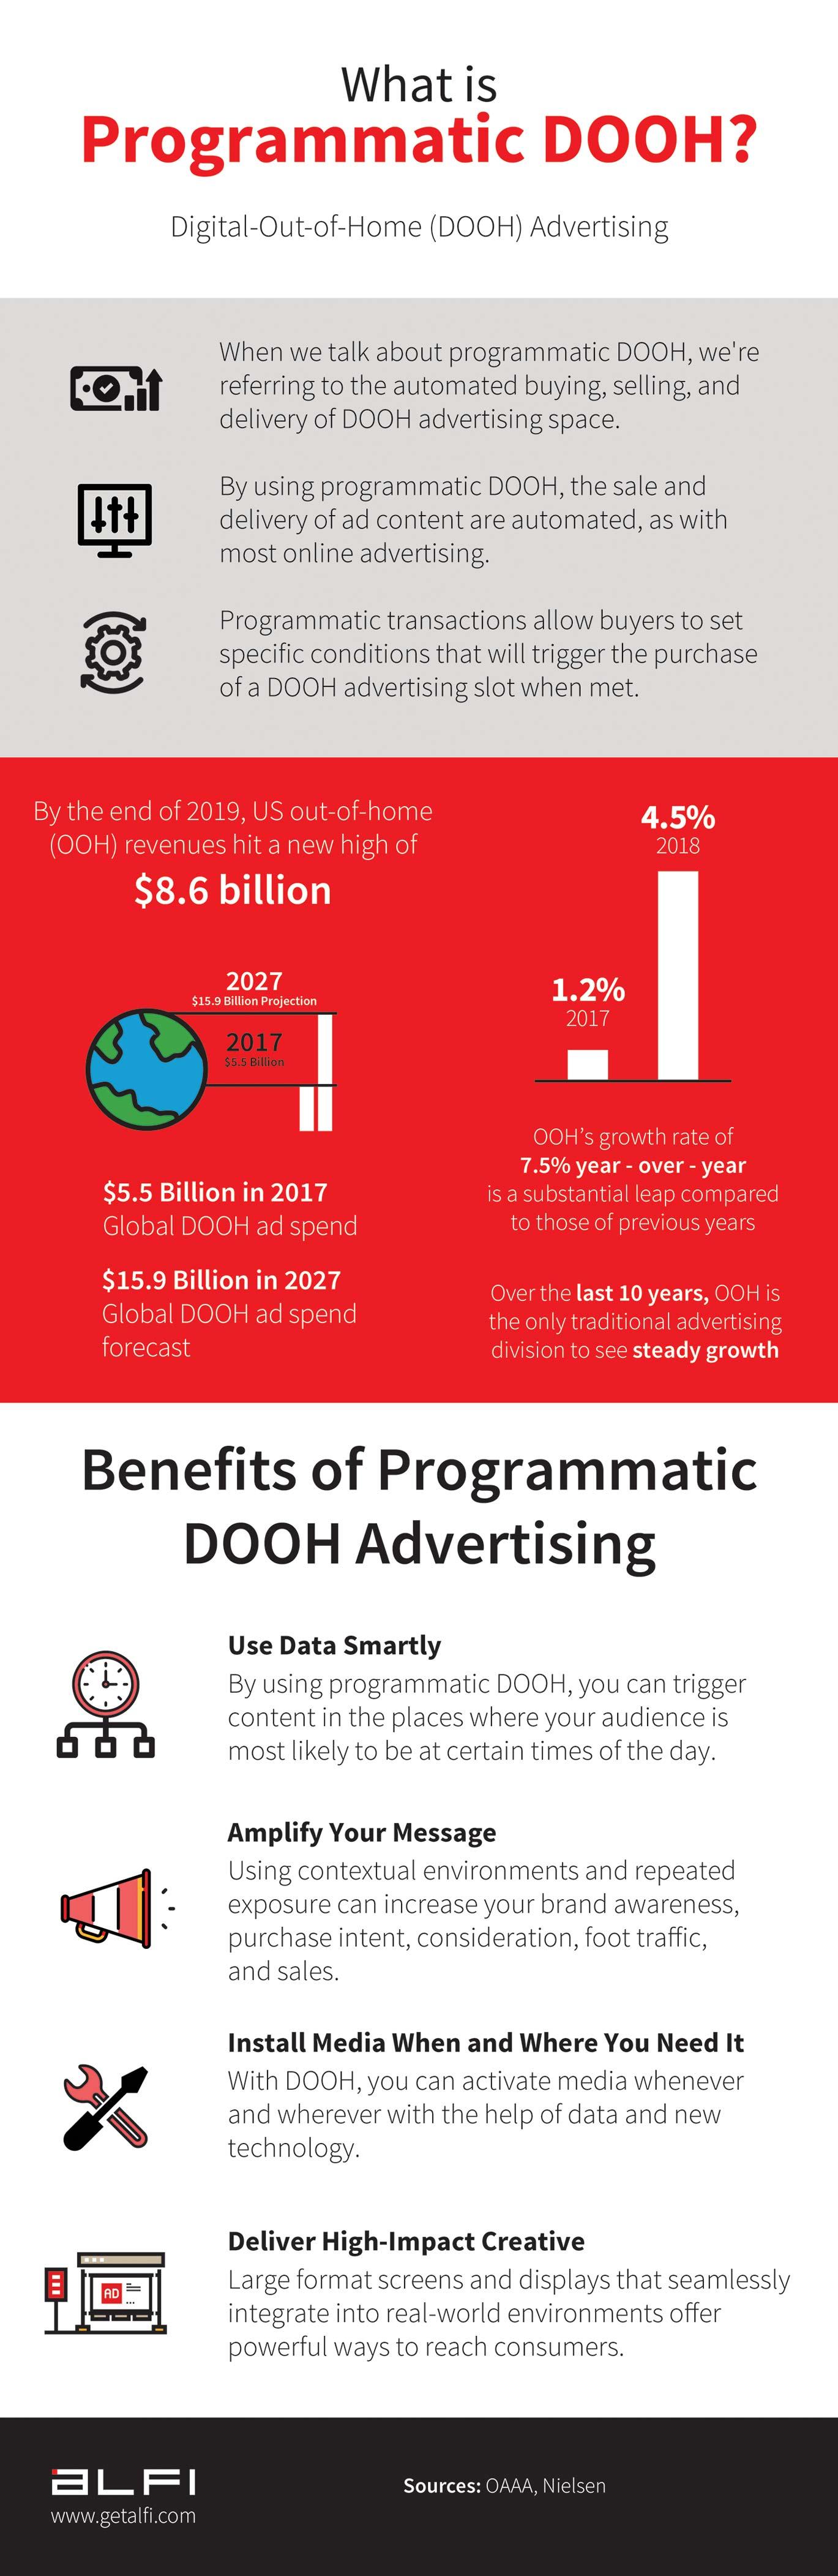 What is Programmatic DOOH advertising - Infographic